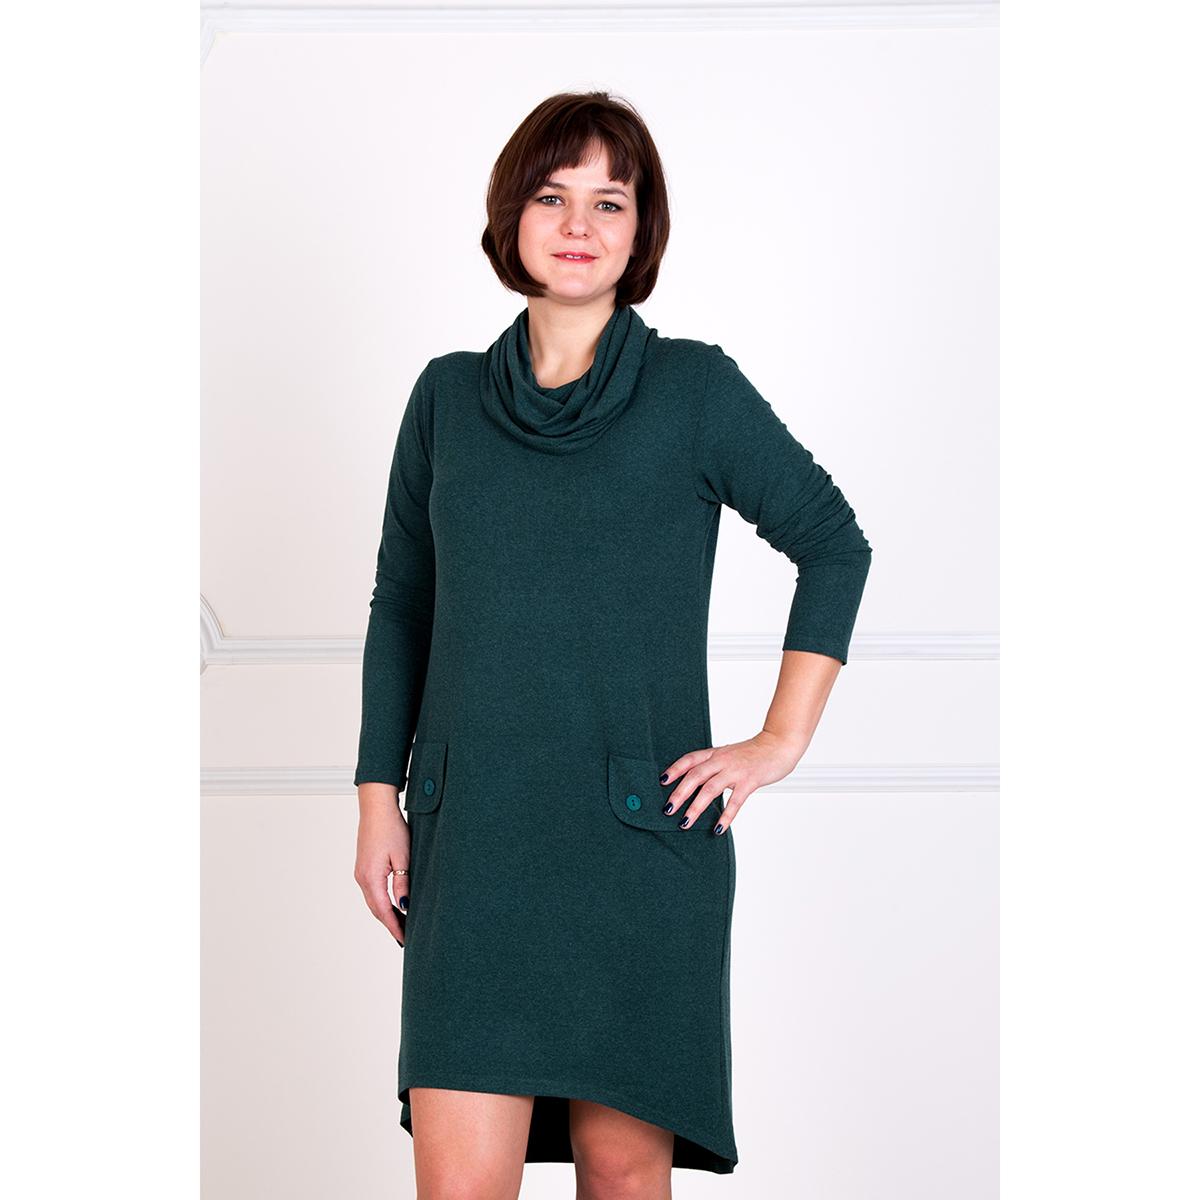 Женское платье Джоли, размер 44Платья, туники<br>Обхват груди:88 см<br>Обхват талии:68 см<br>Обхват бедер:96 см<br>Рост:167 см<br><br>Тип: Жен. платье<br>Размер: 44<br>Материал: Ангора